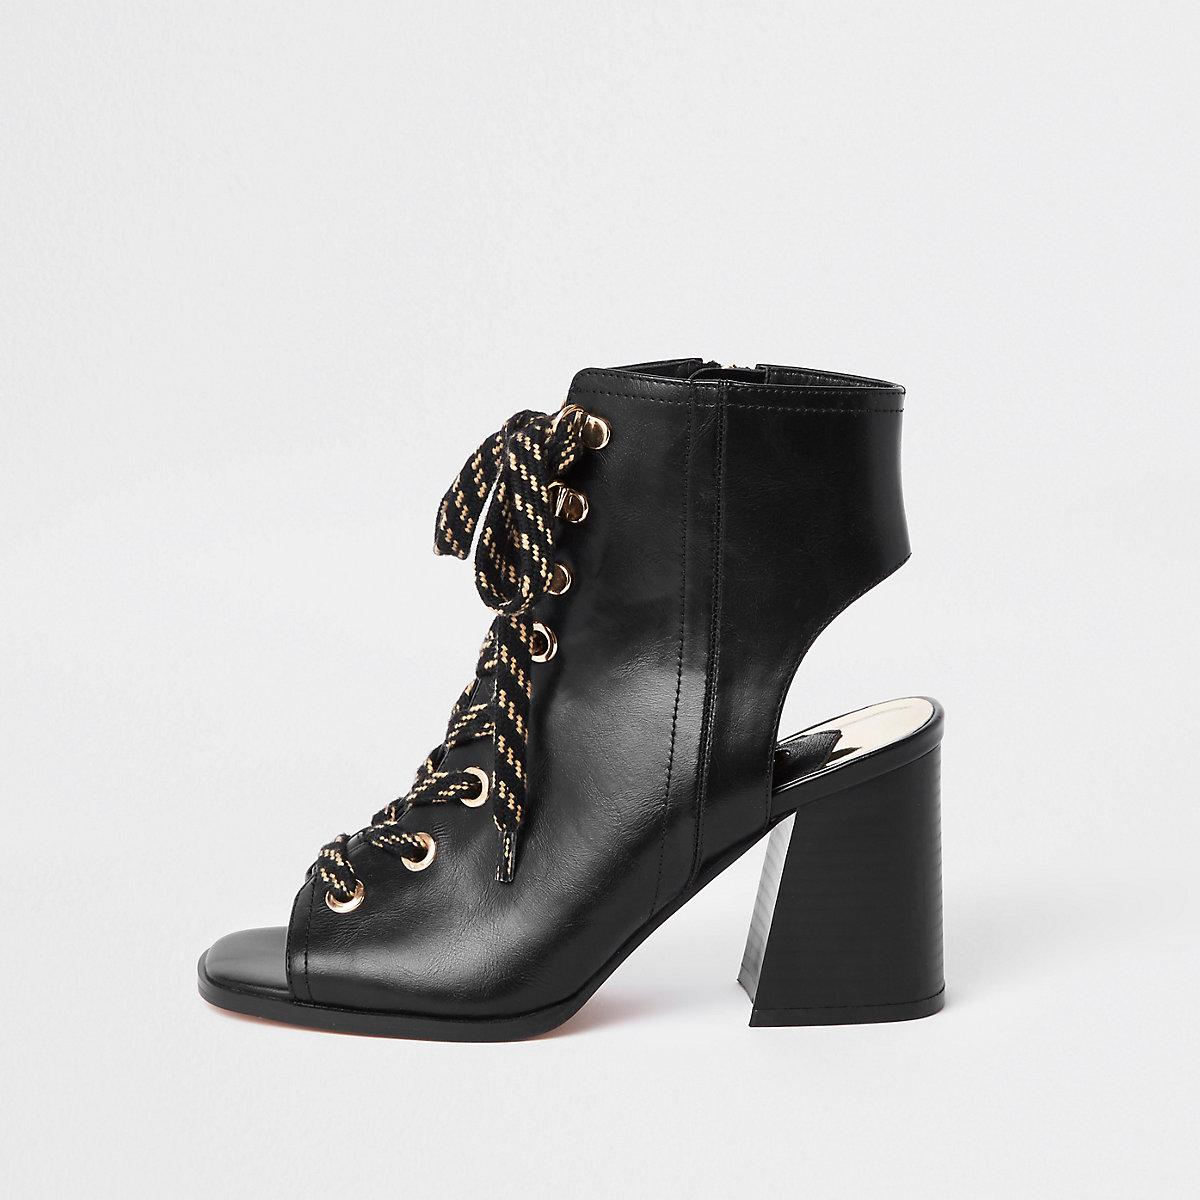 Black lace-up block heel shoe boots